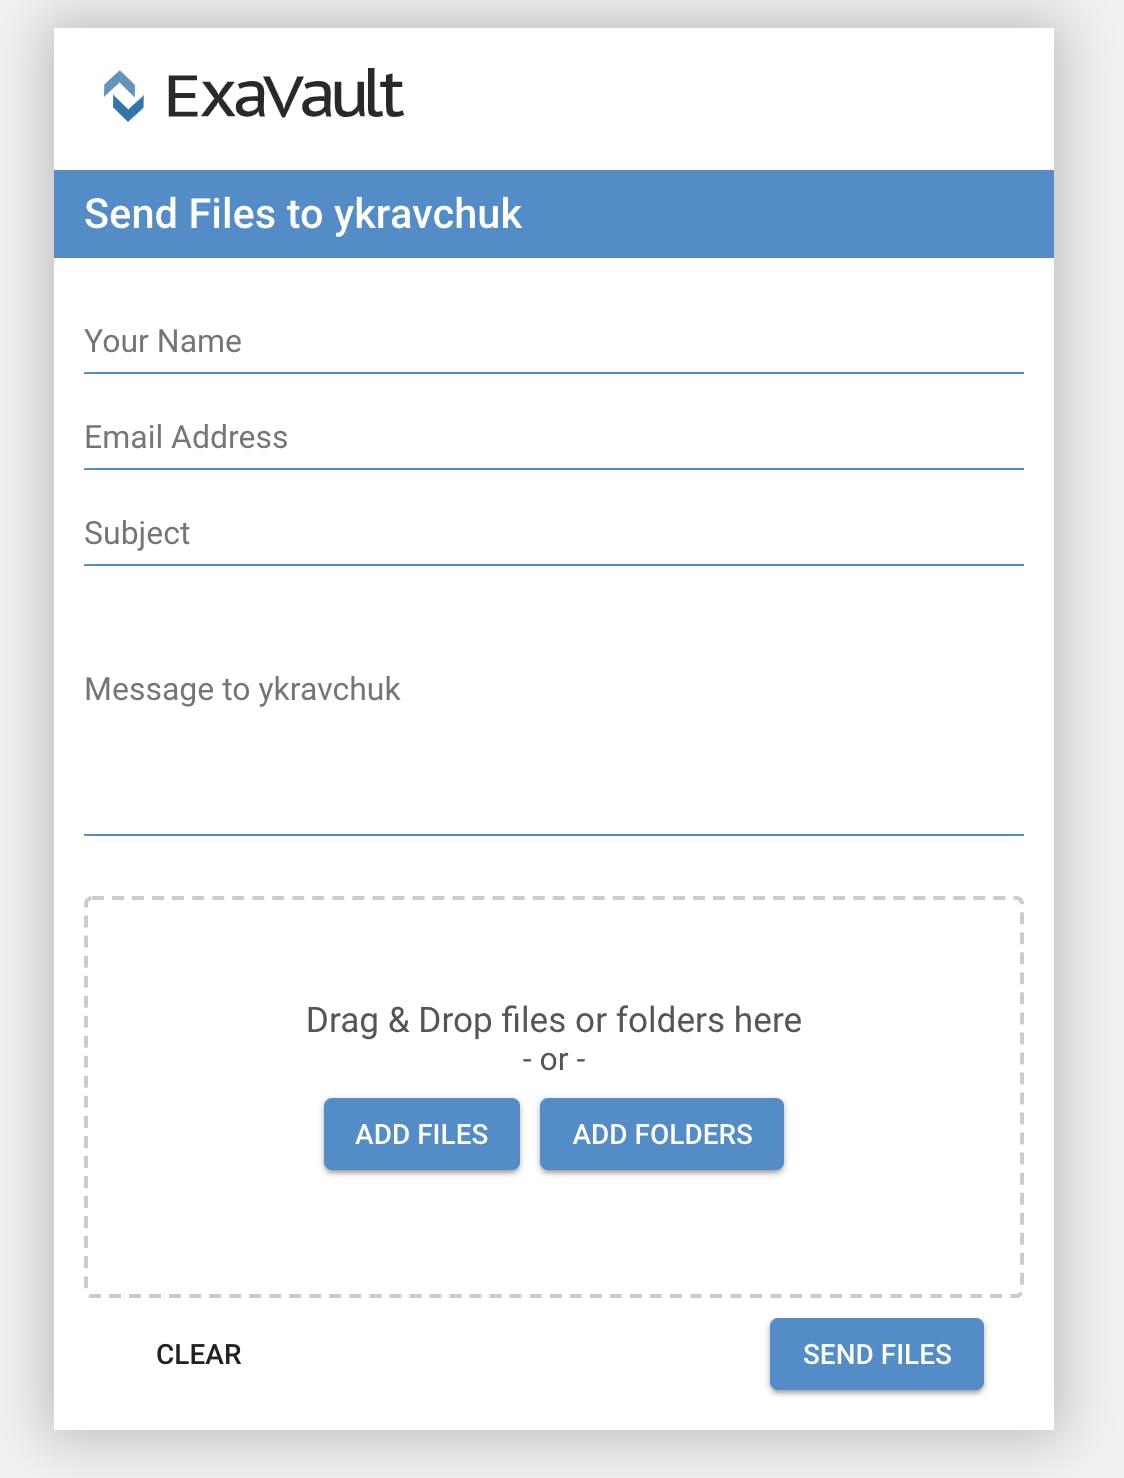 Basic ExaVault upload form.